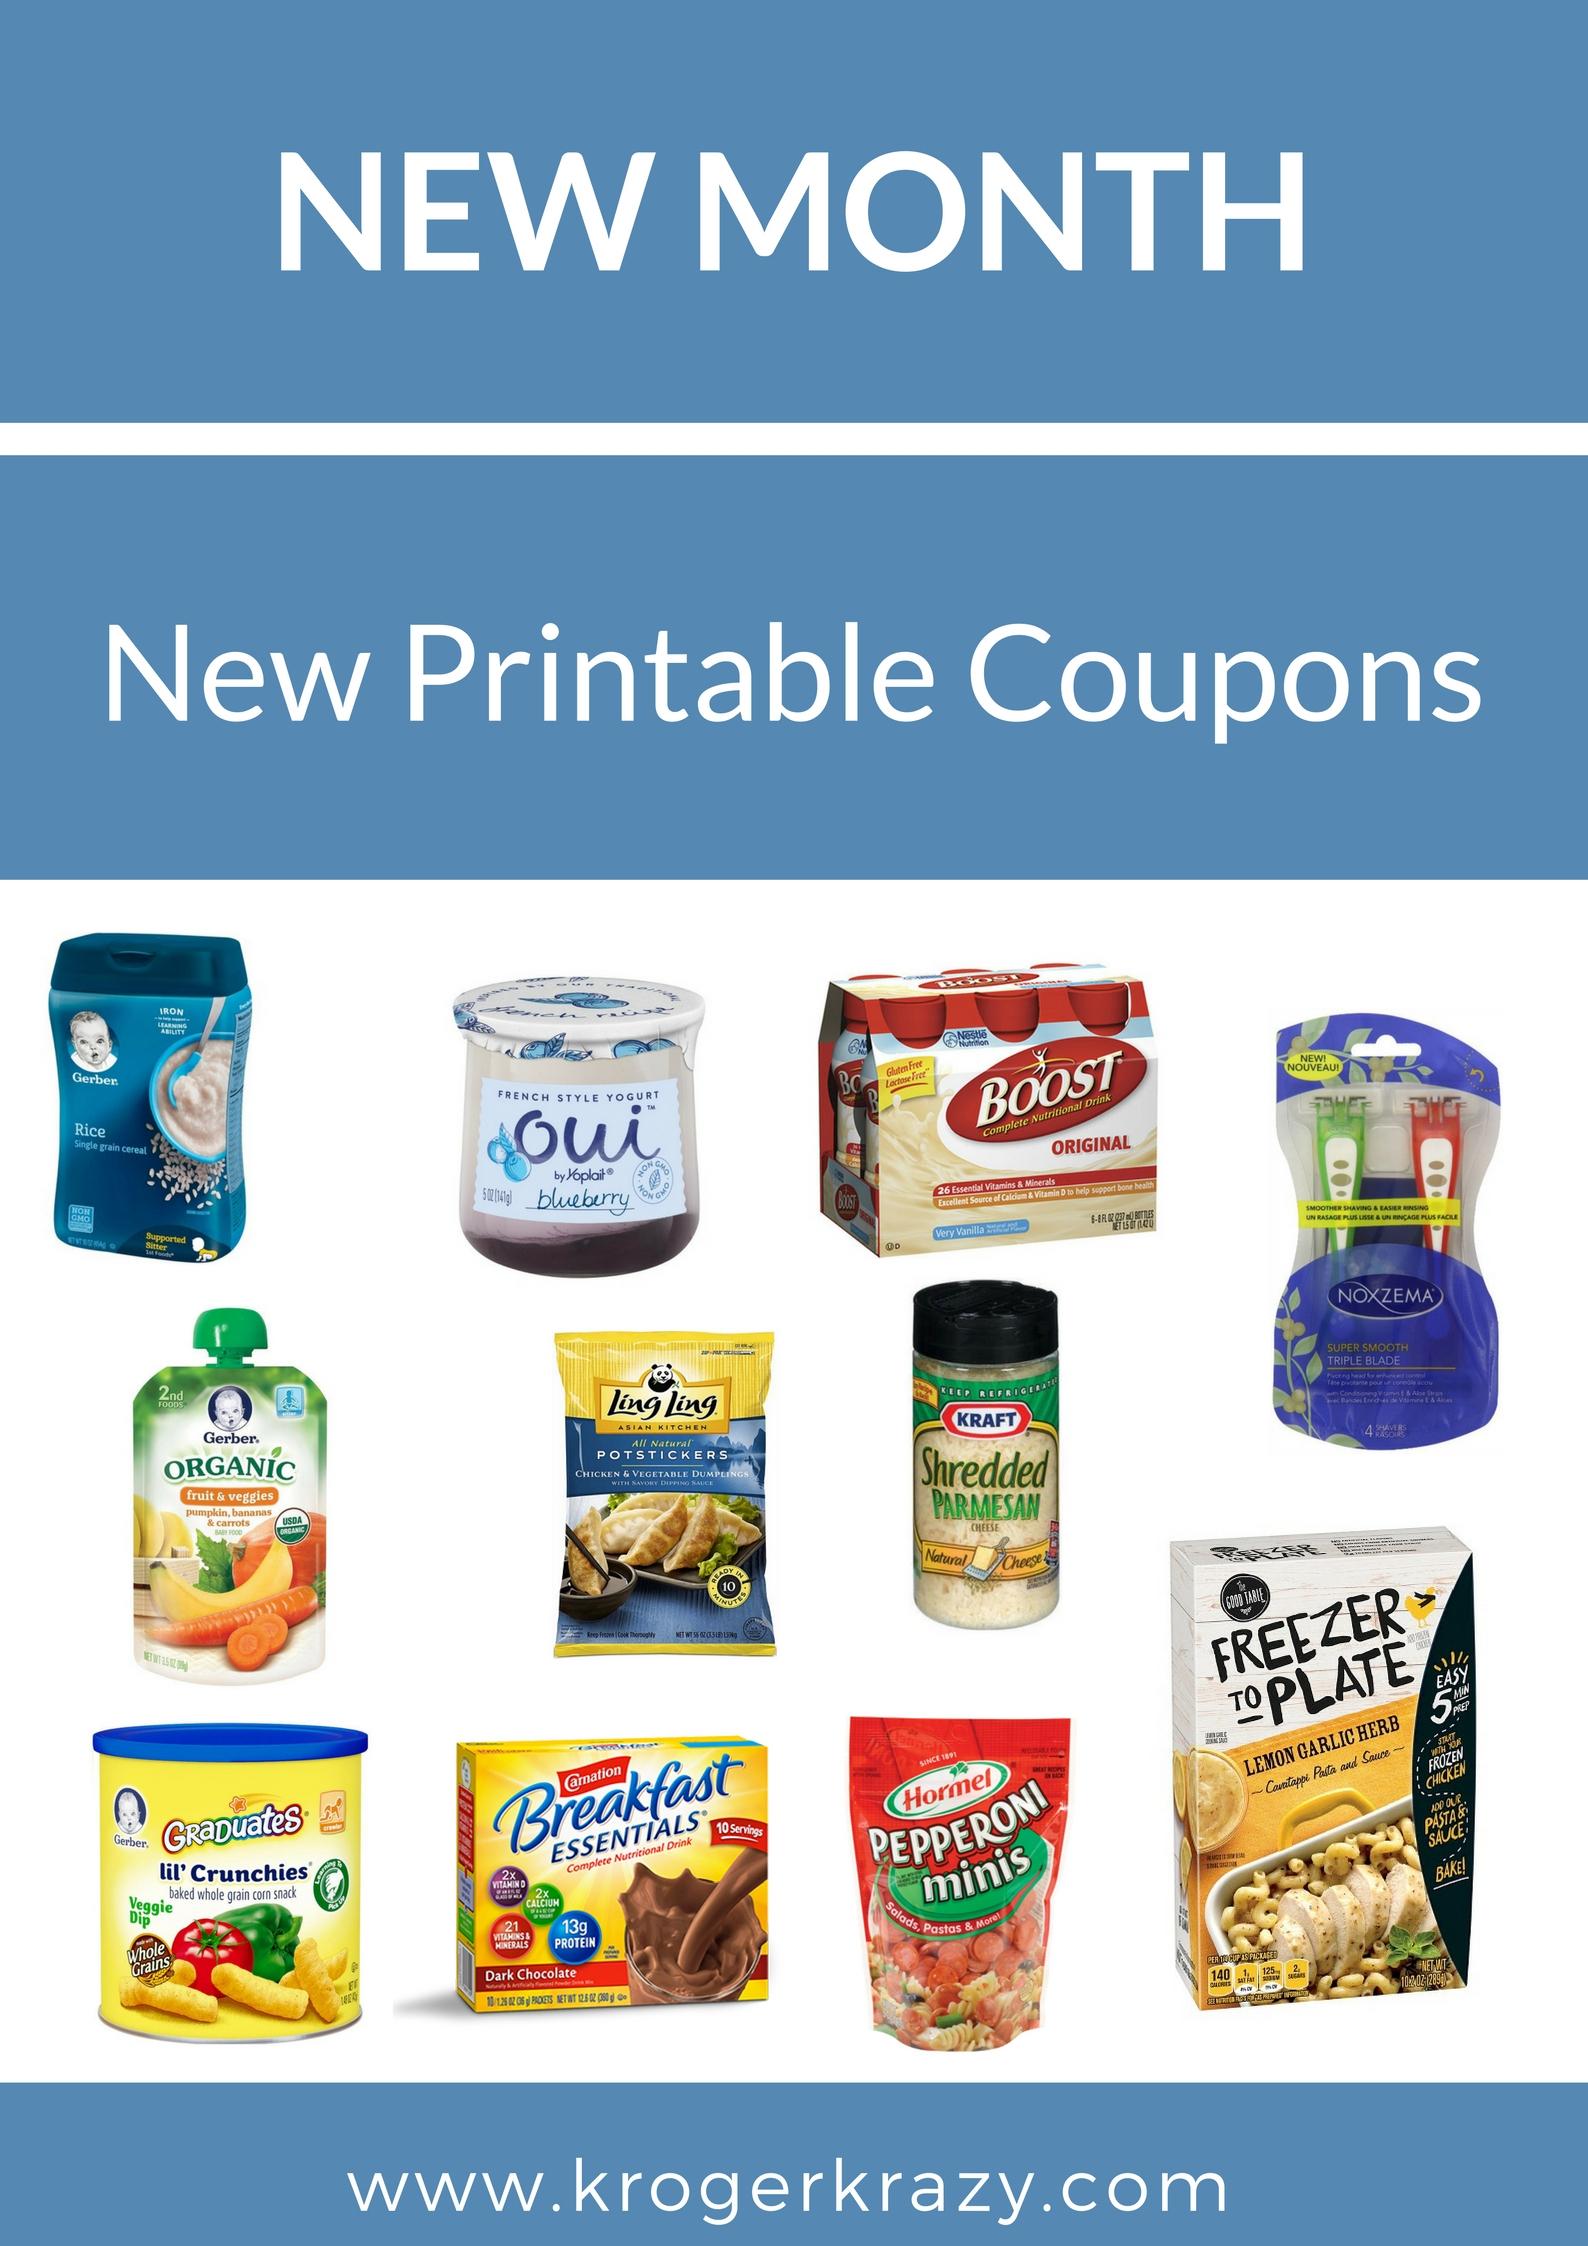 Kraft Food Coupons Printable | Download Them And Try To Solve - Free Printable Kraft Food Coupons